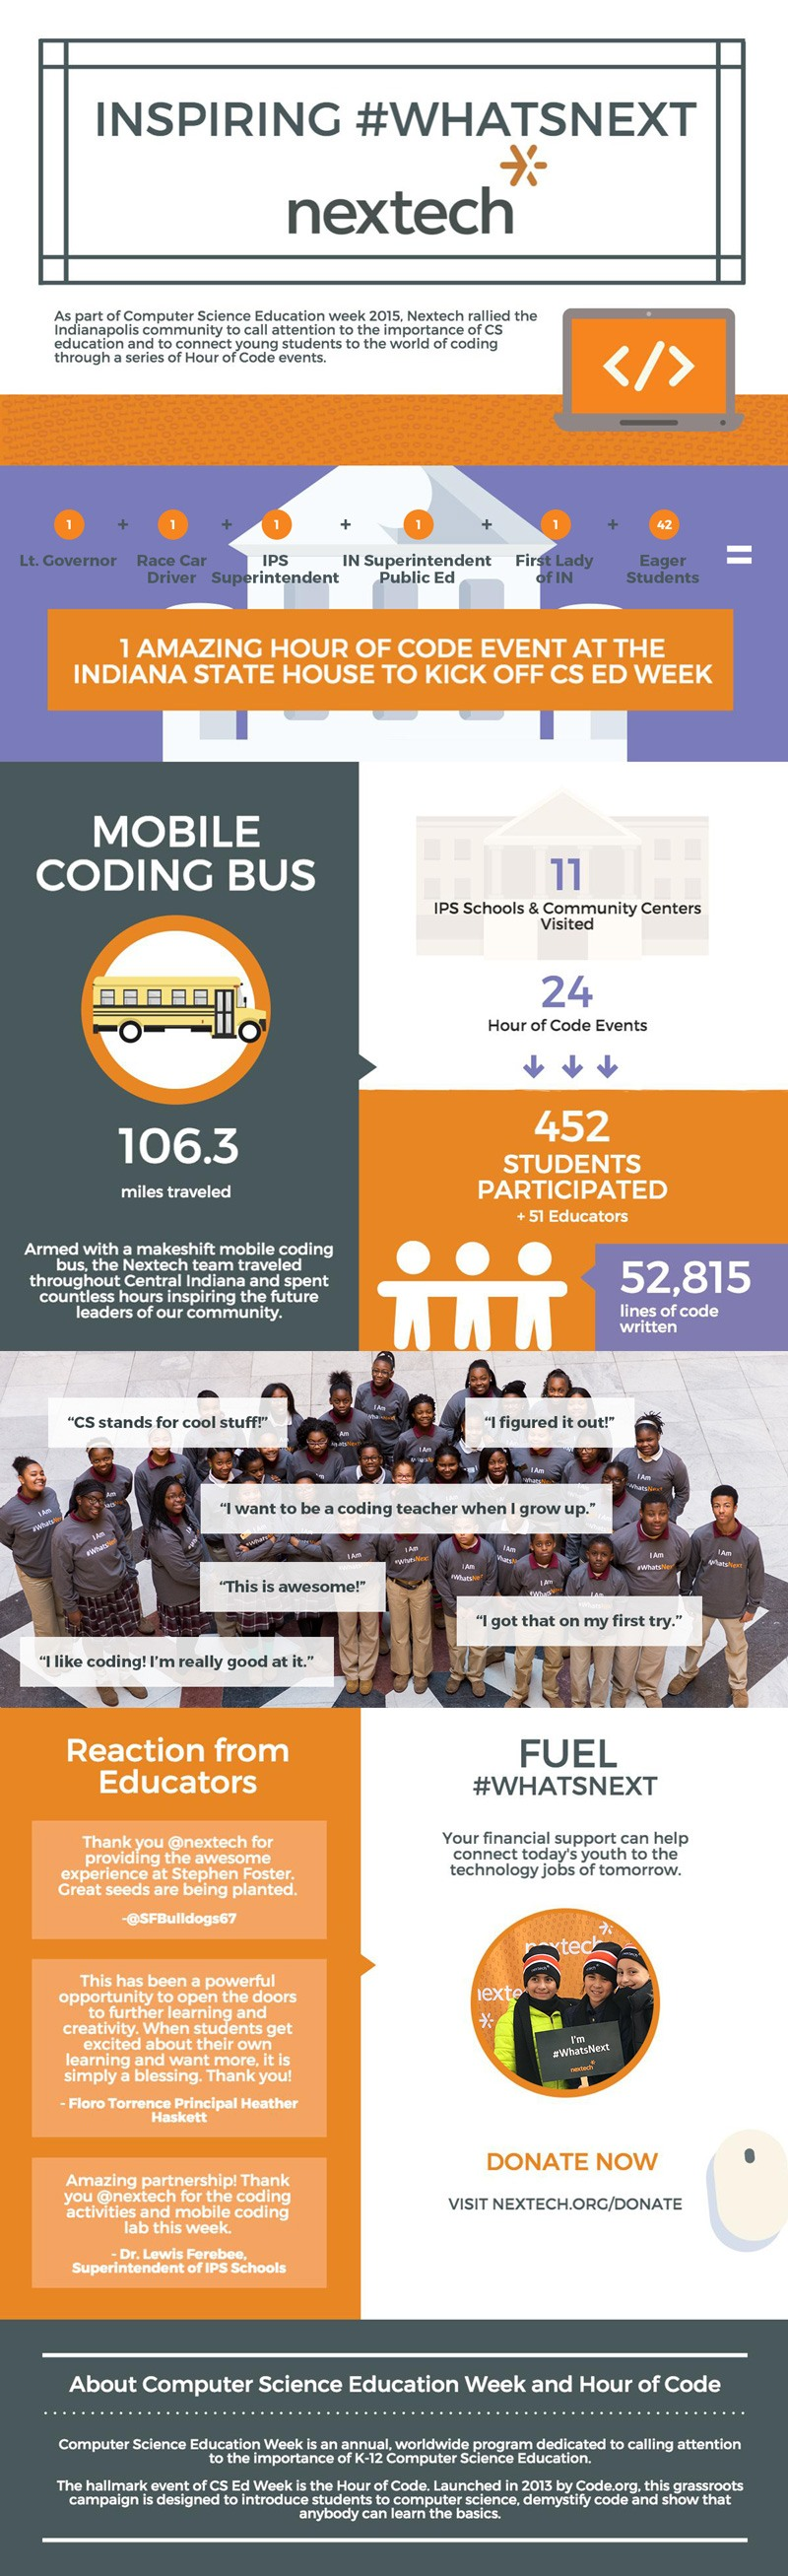 nextech-infographic-web